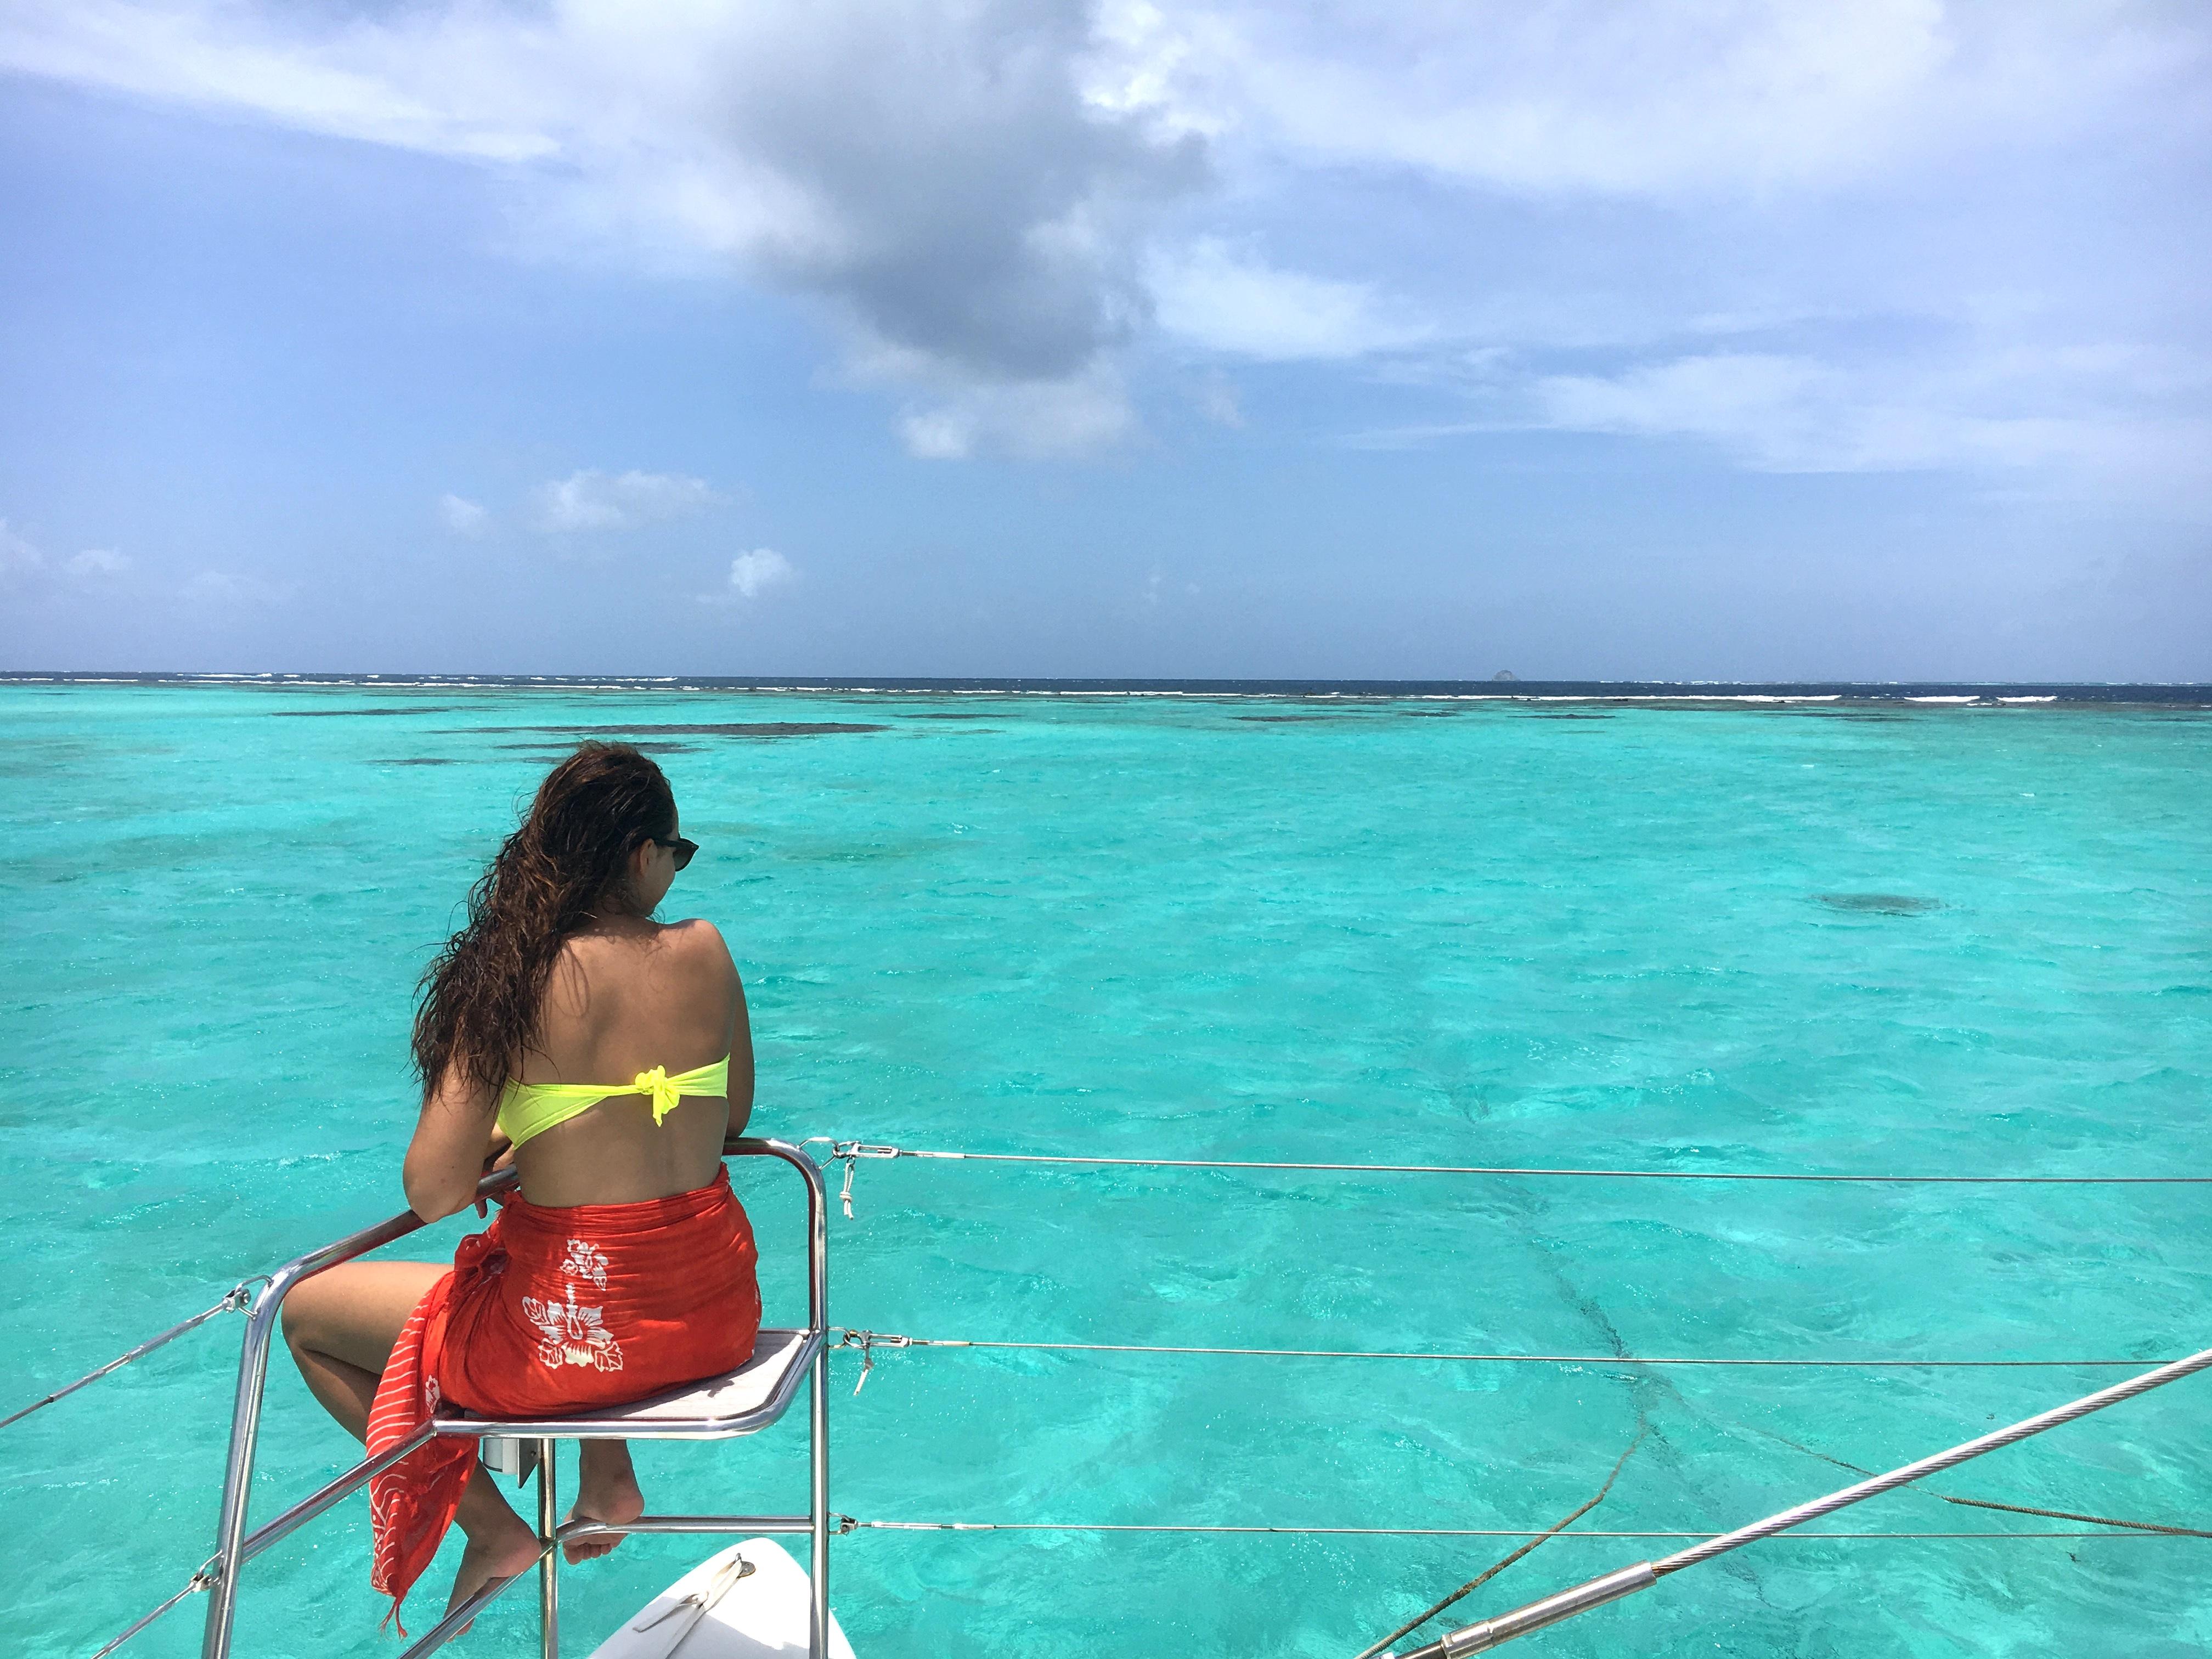 Vacanze in catamarano ai Caraibi